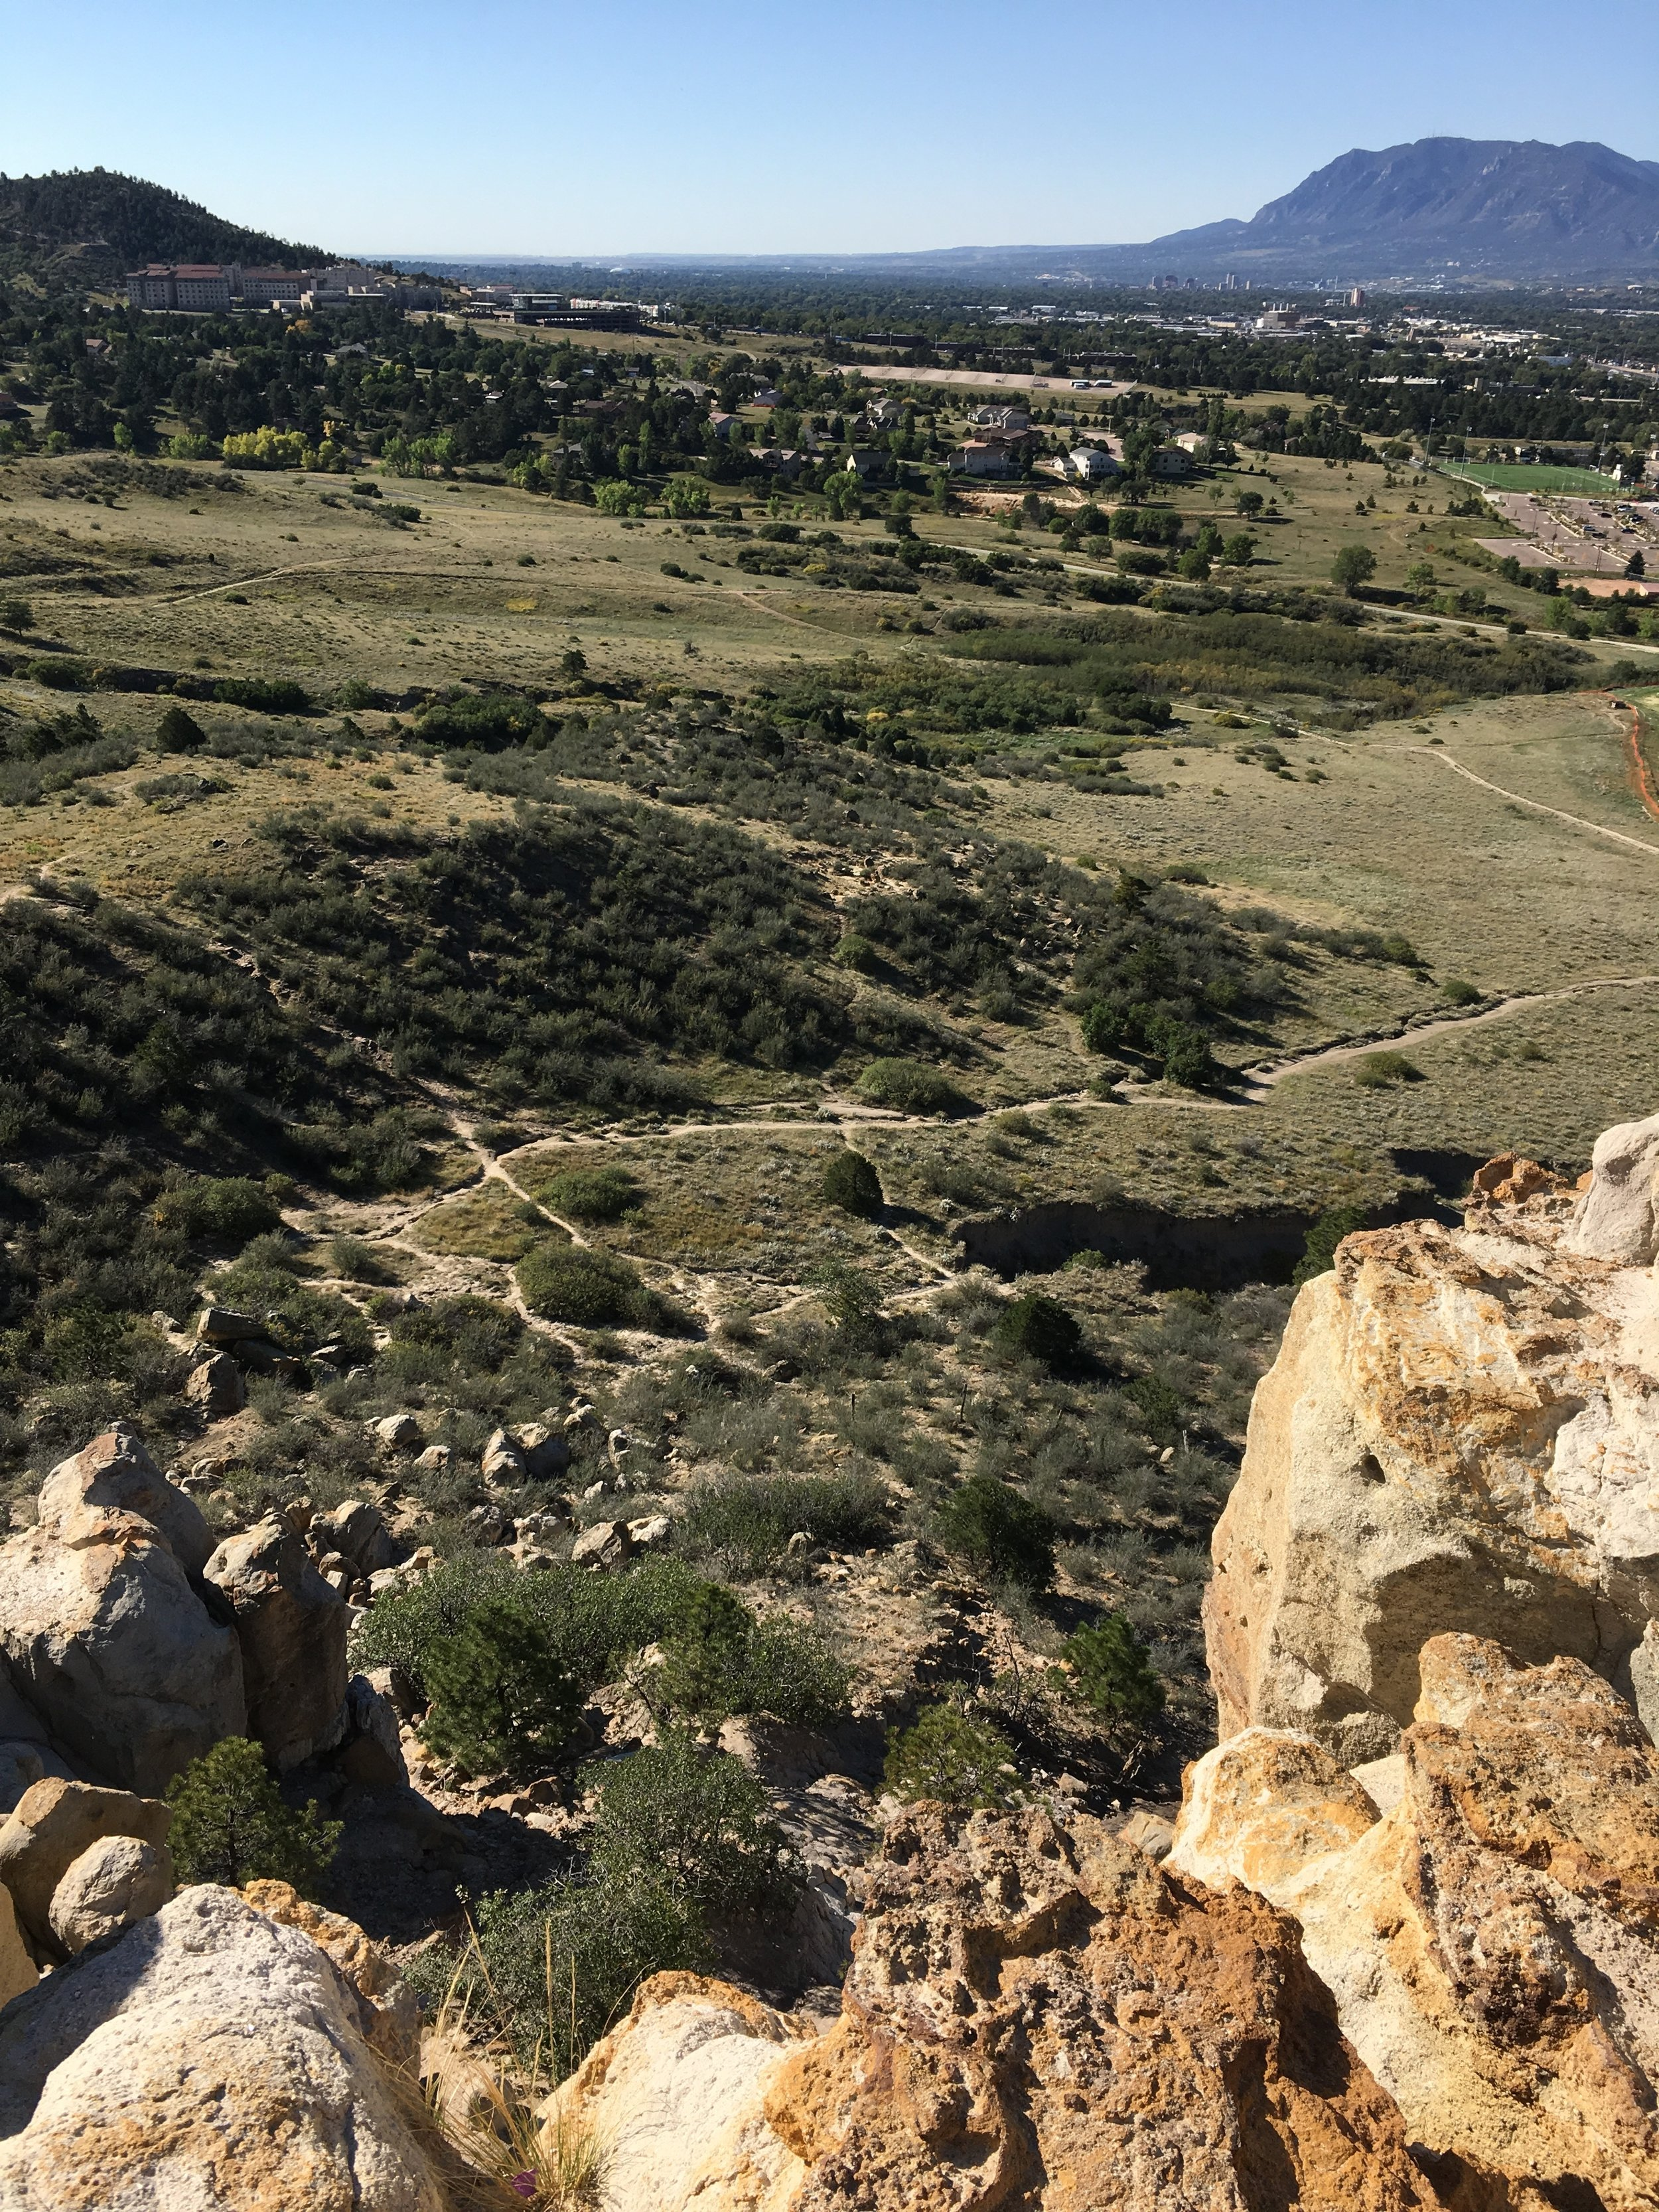 Austin Bluffs Open Space Management and Master Plan